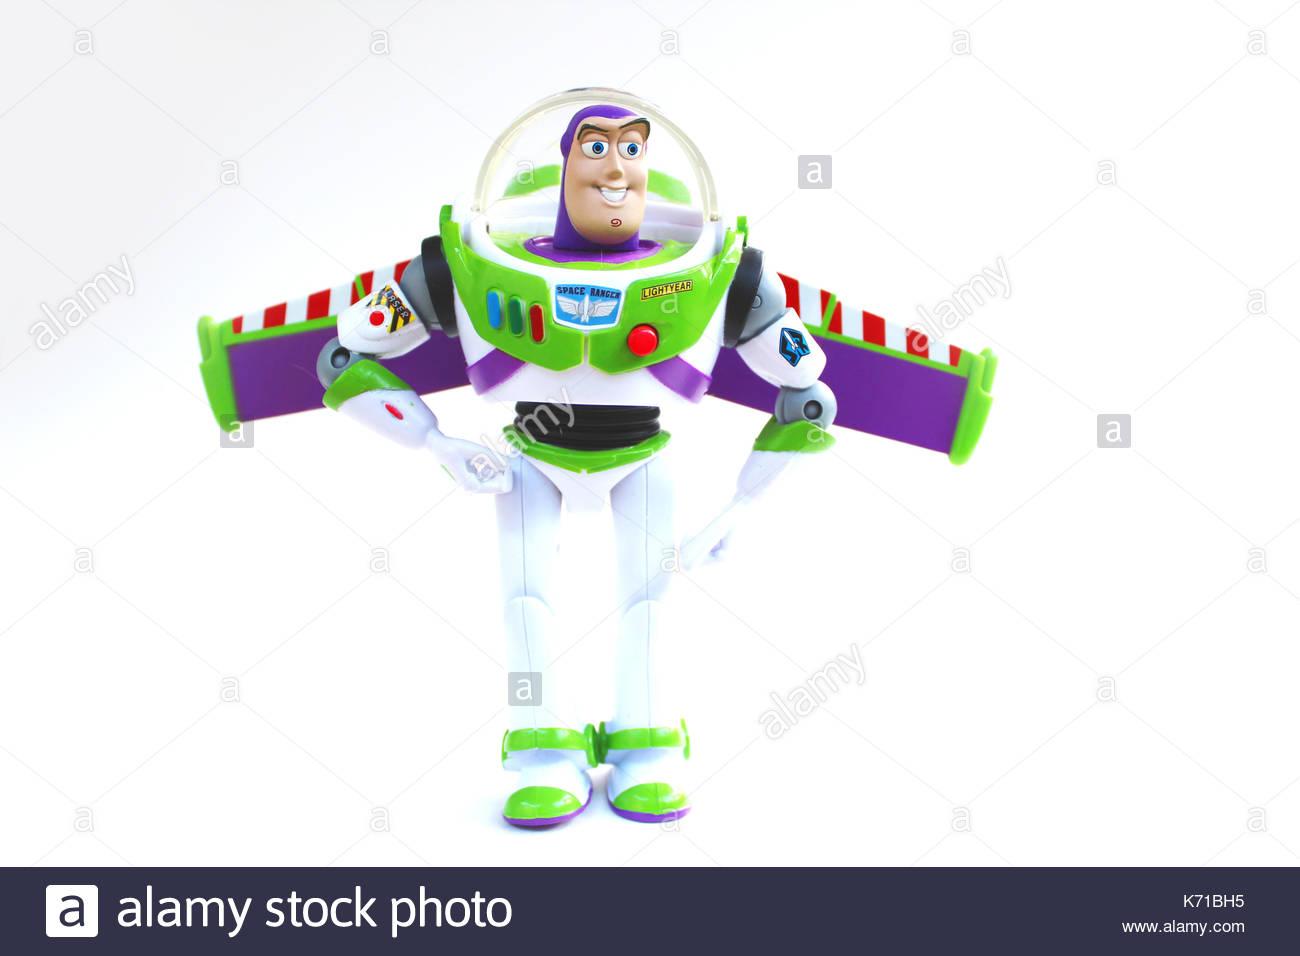 Buzz Lightyear Action Figure - Stock Image